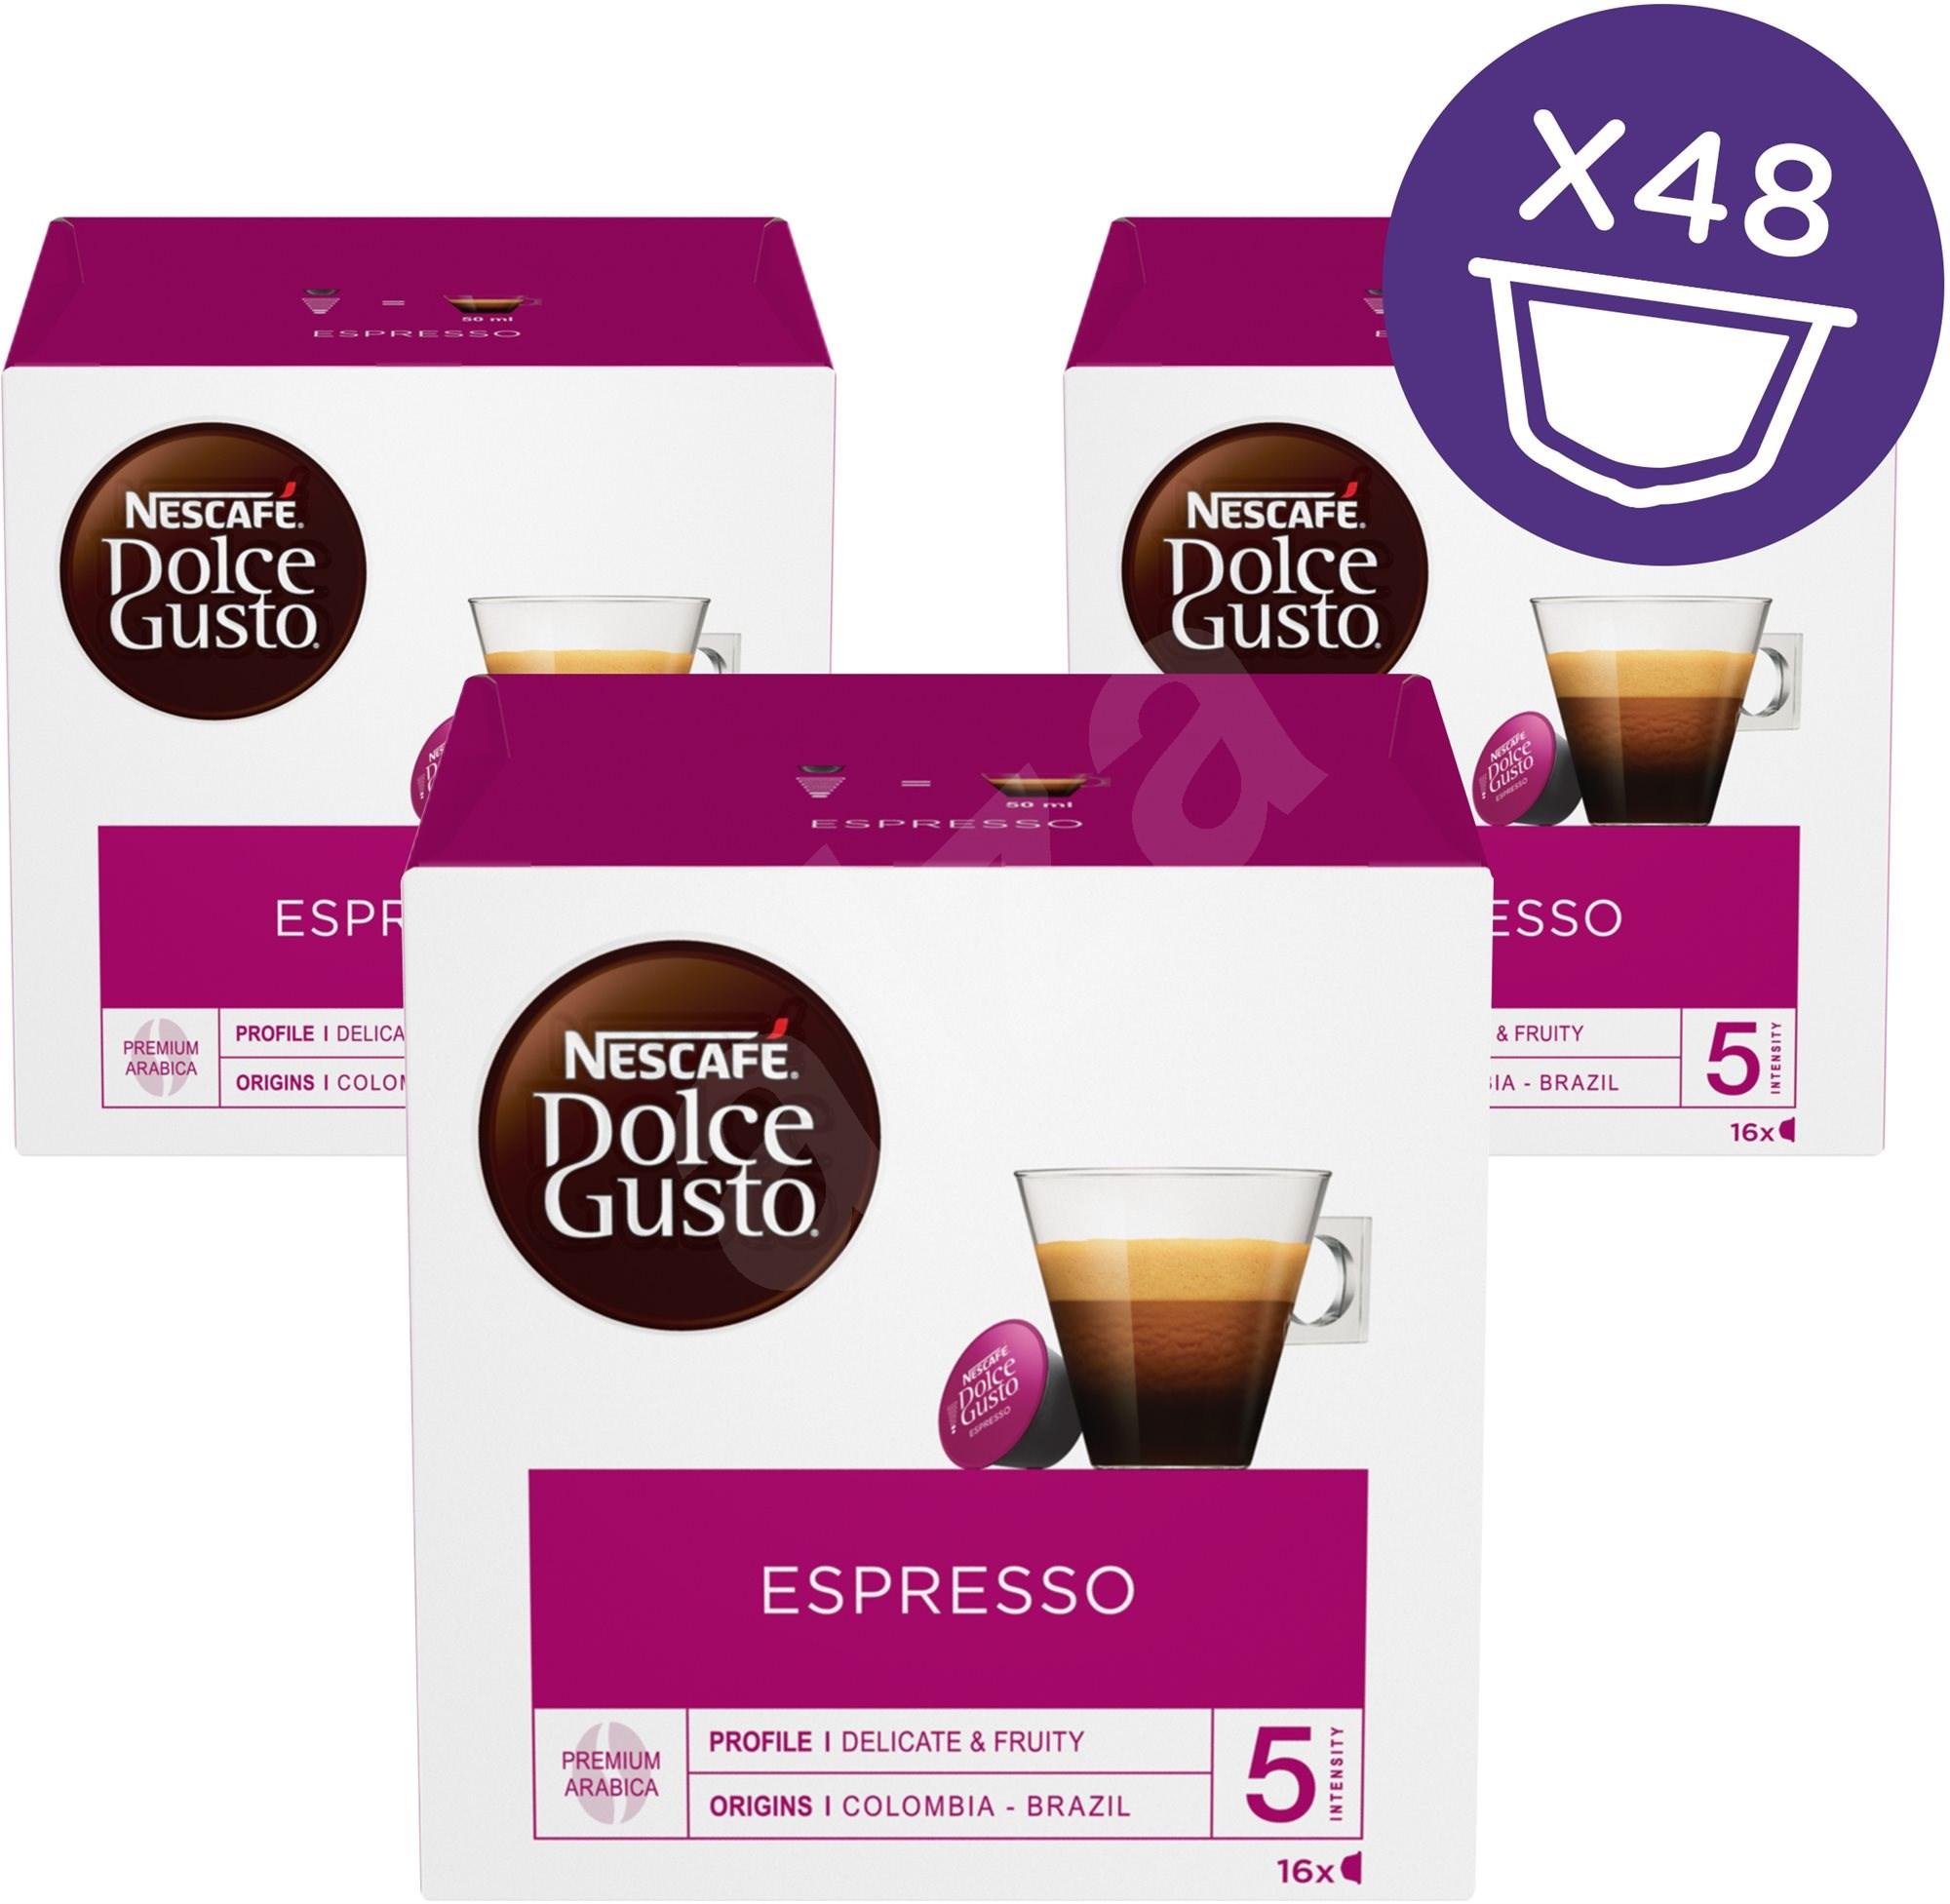 nescaf dolce gusto espresso 16 pcs x 3 coffee capsules. Black Bedroom Furniture Sets. Home Design Ideas